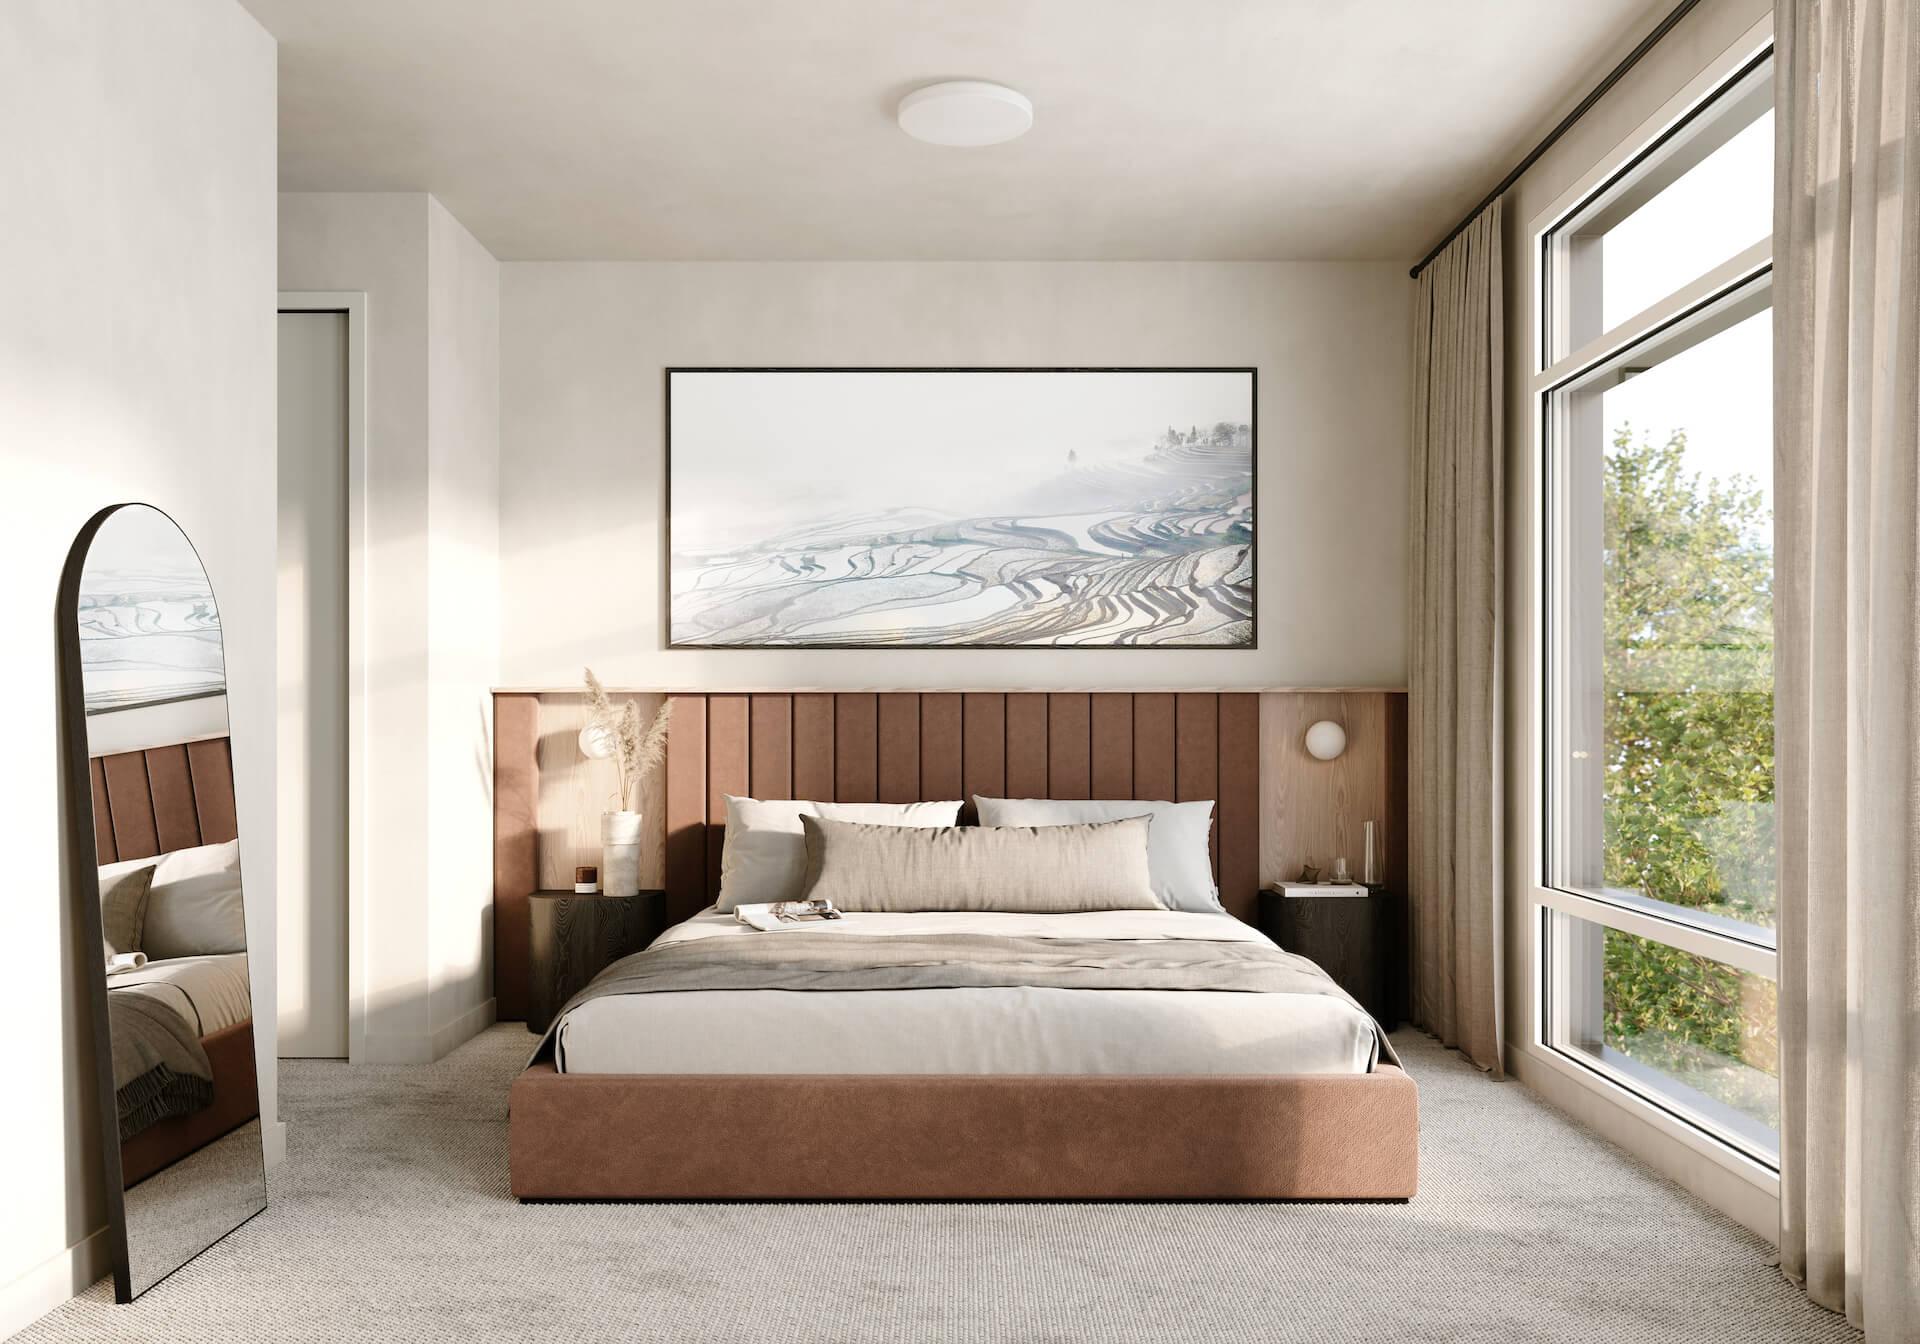 Rowen W47 - Bedroom